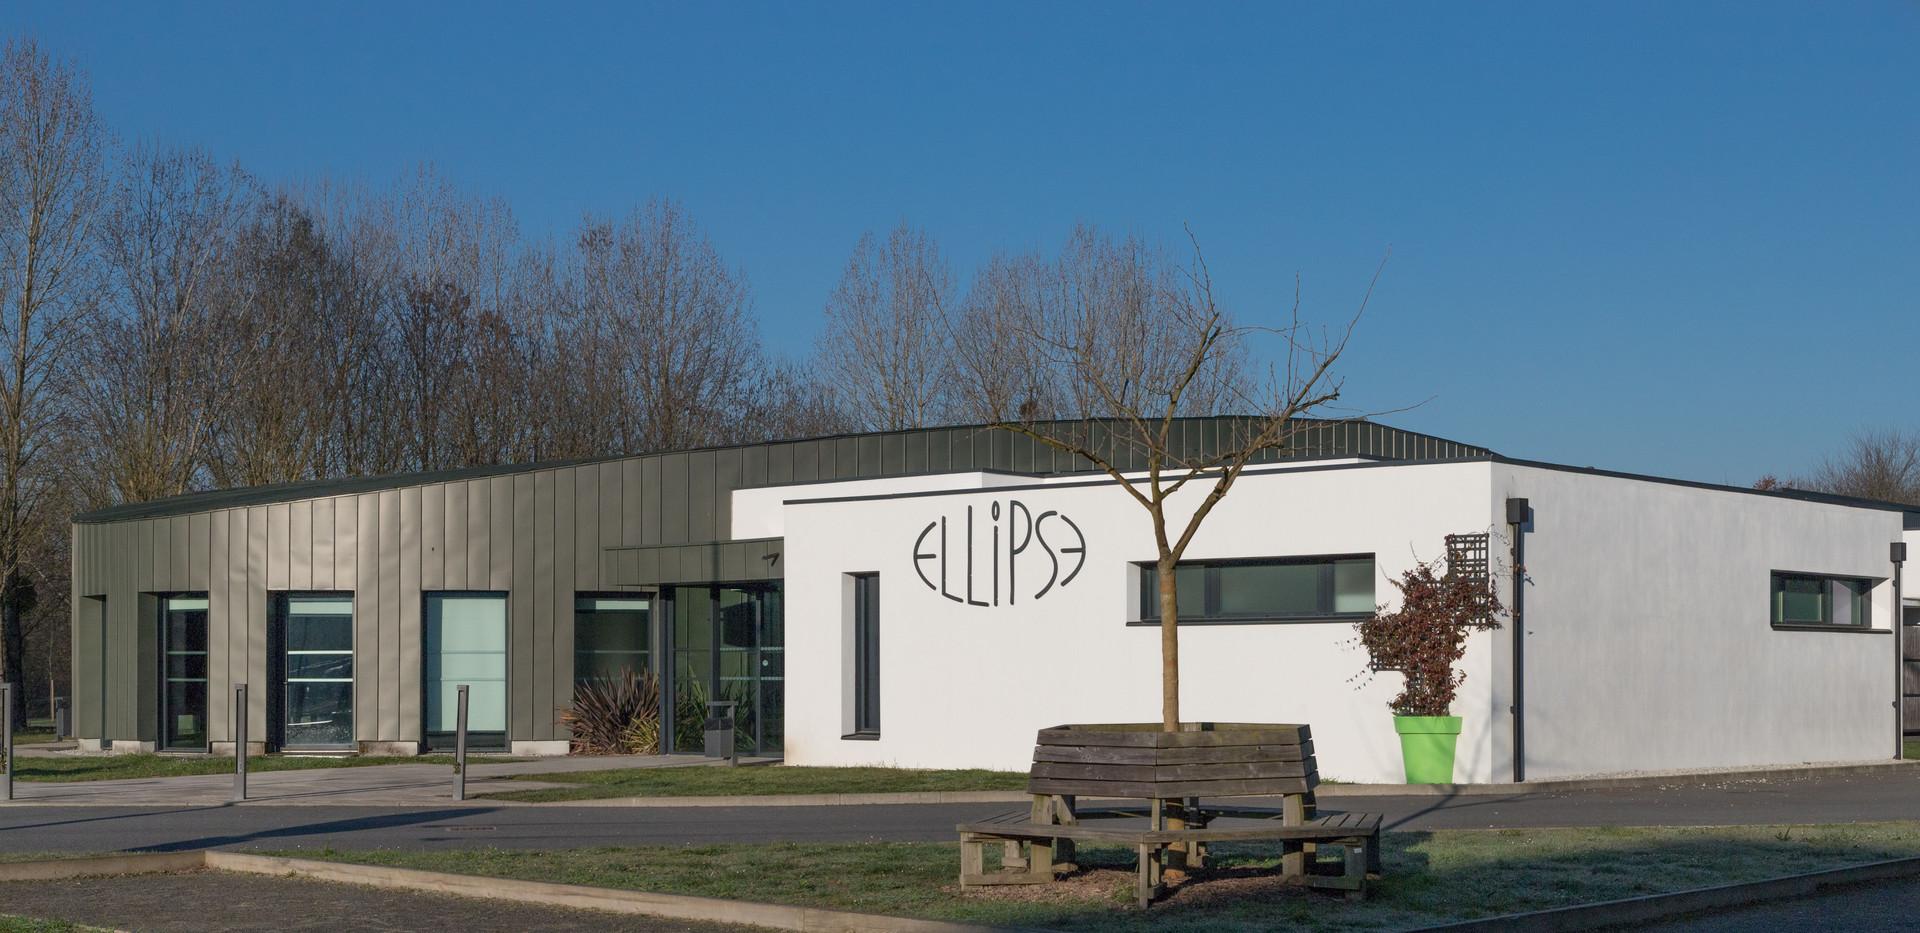 Ellipse Chaumes-3comp.jpg